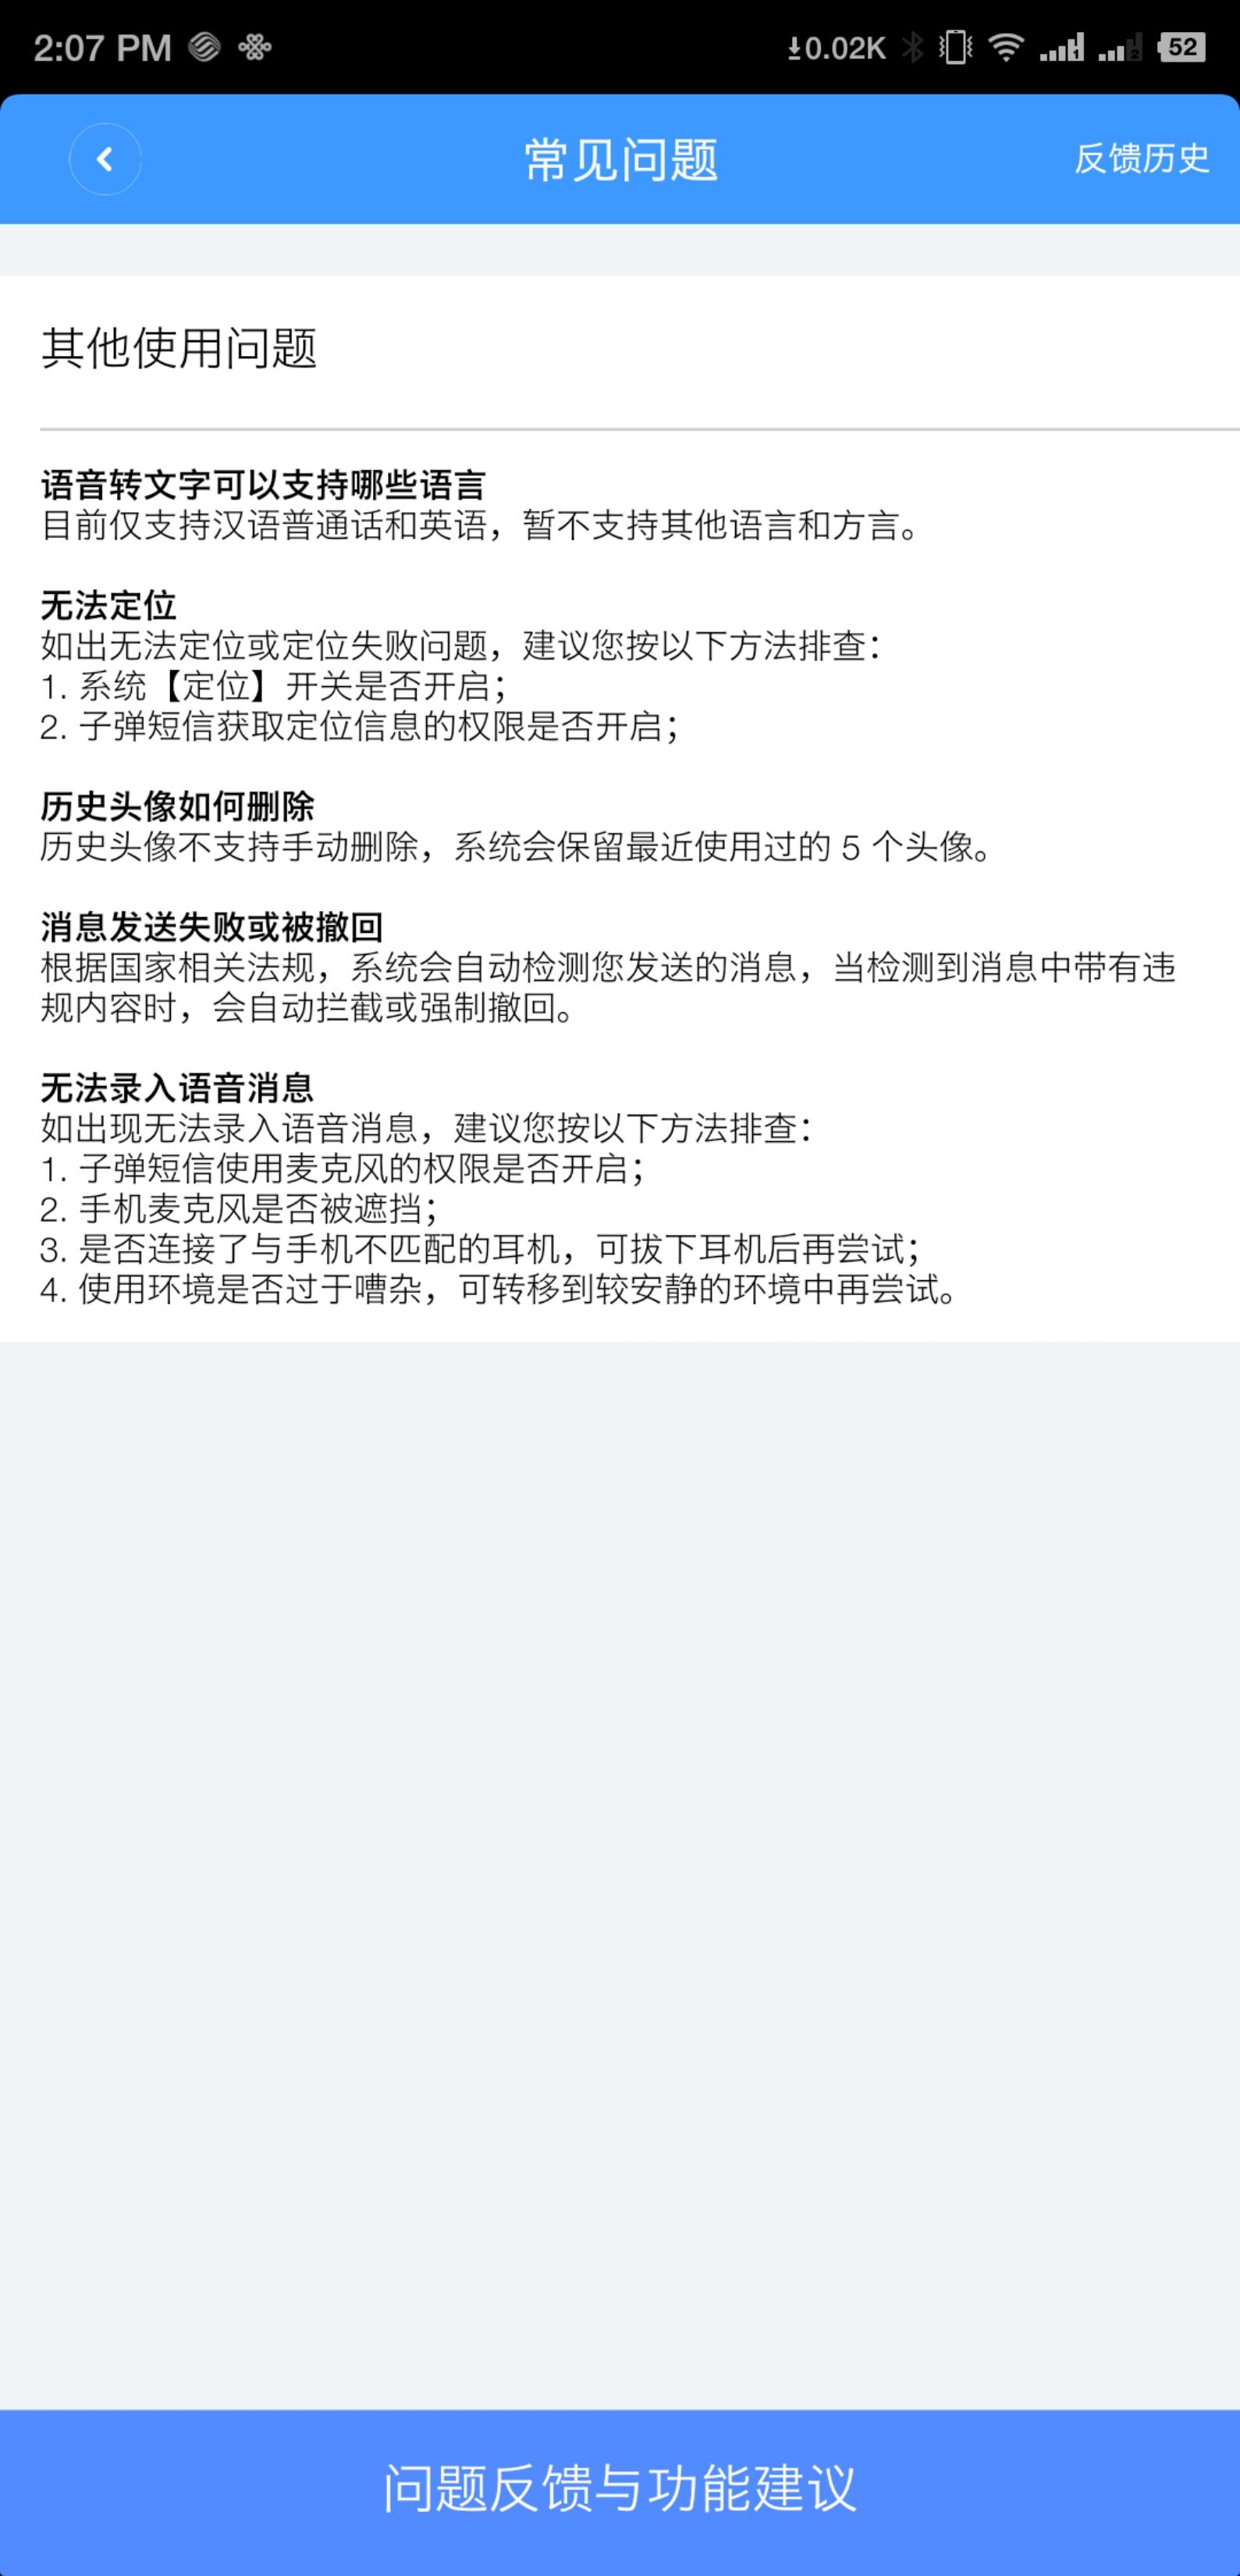 Screenshot_2019-01-15-14-07-42-472_???.png